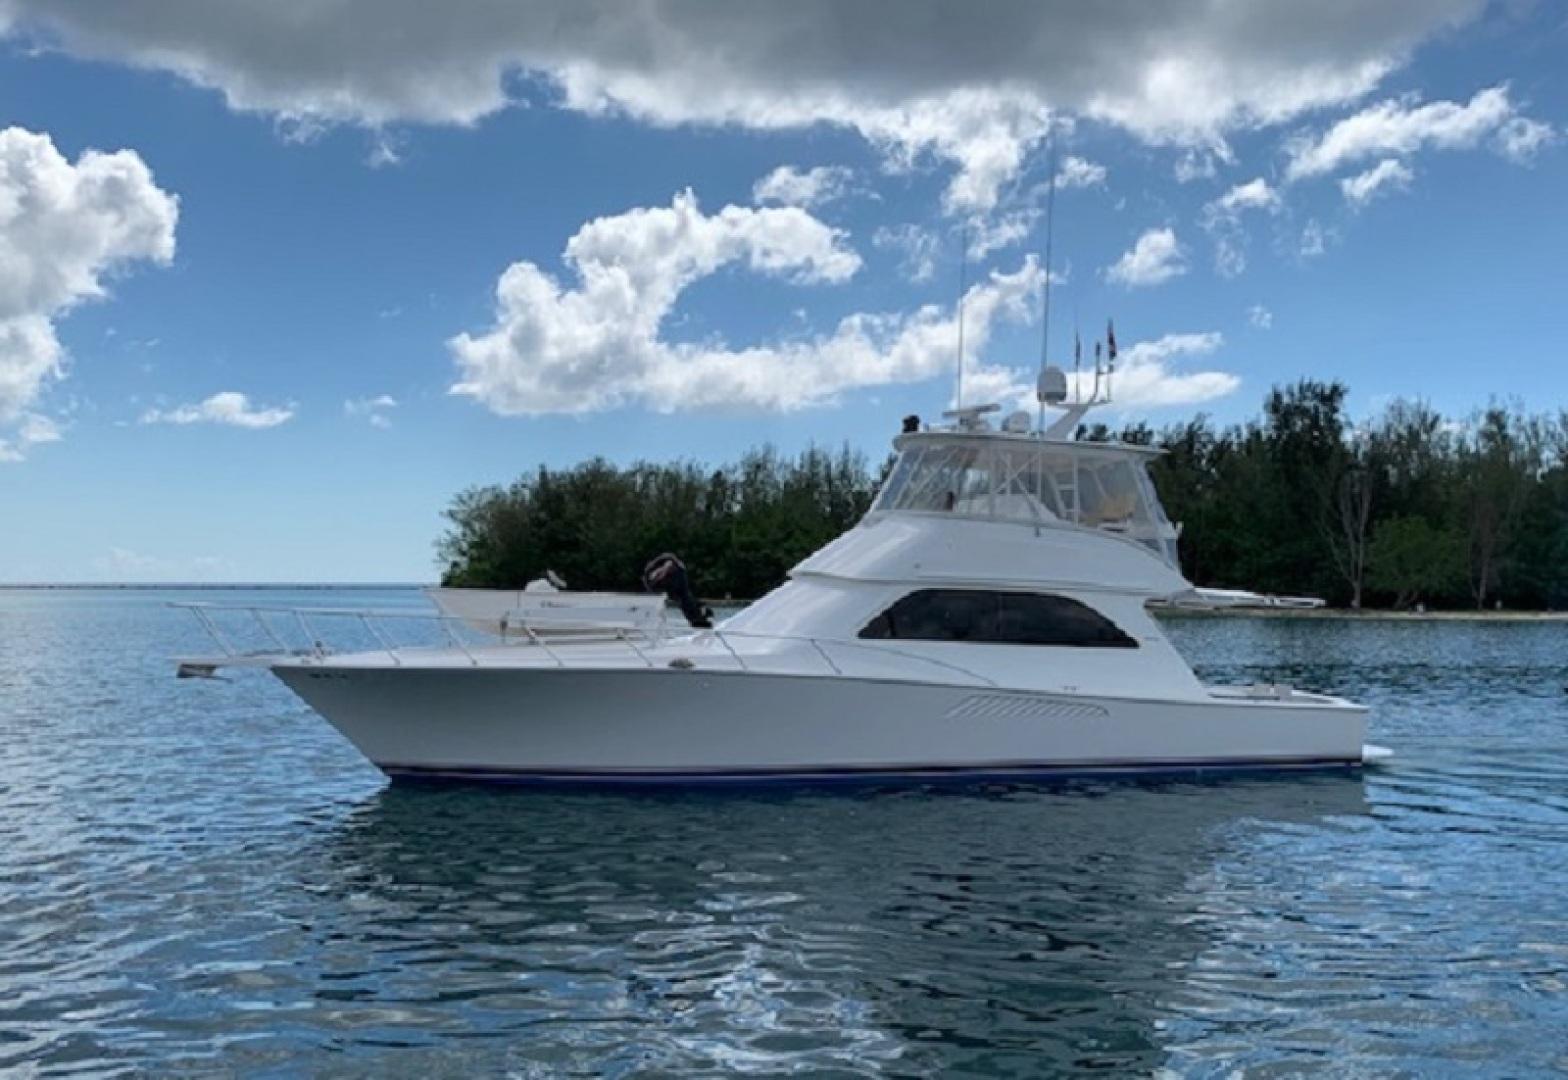 Viking-Convertible 2003-Ayayaiii Fort Lauderdale-Florida-United States-Port Profile-1544379 | Thumbnail